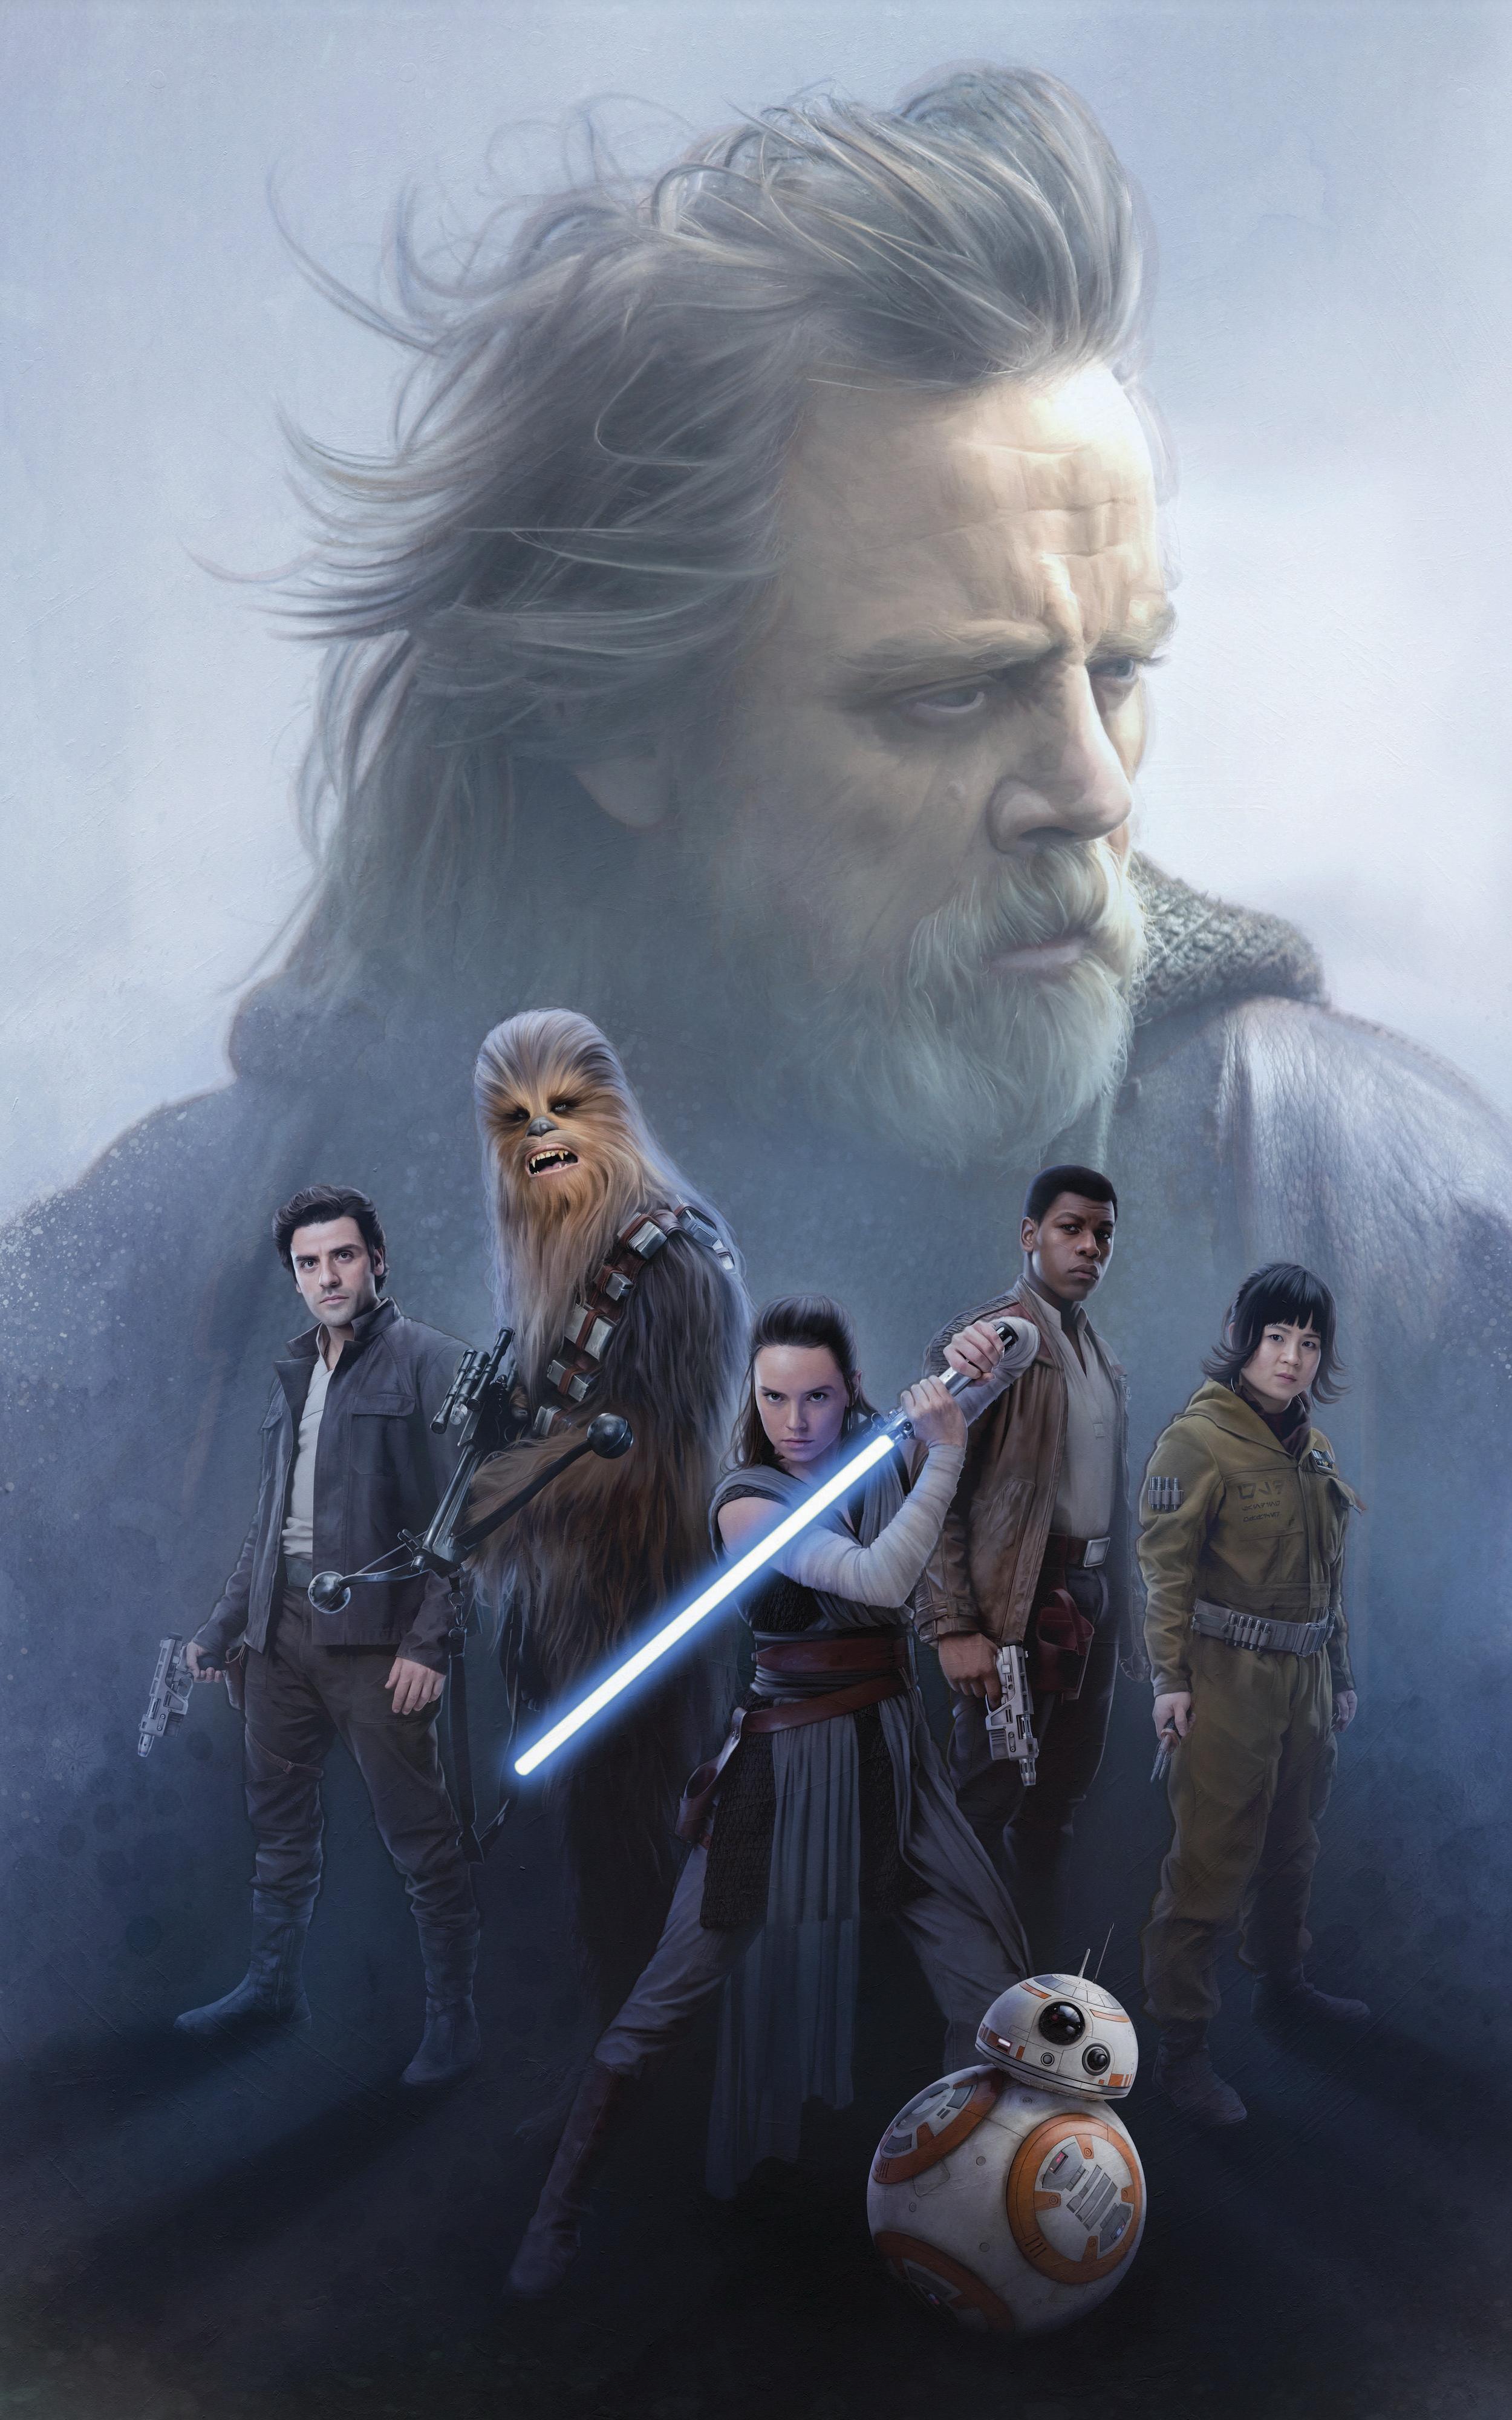 Star Wars New Movie 2018 2500x4000 Wallpaper Teahub Io